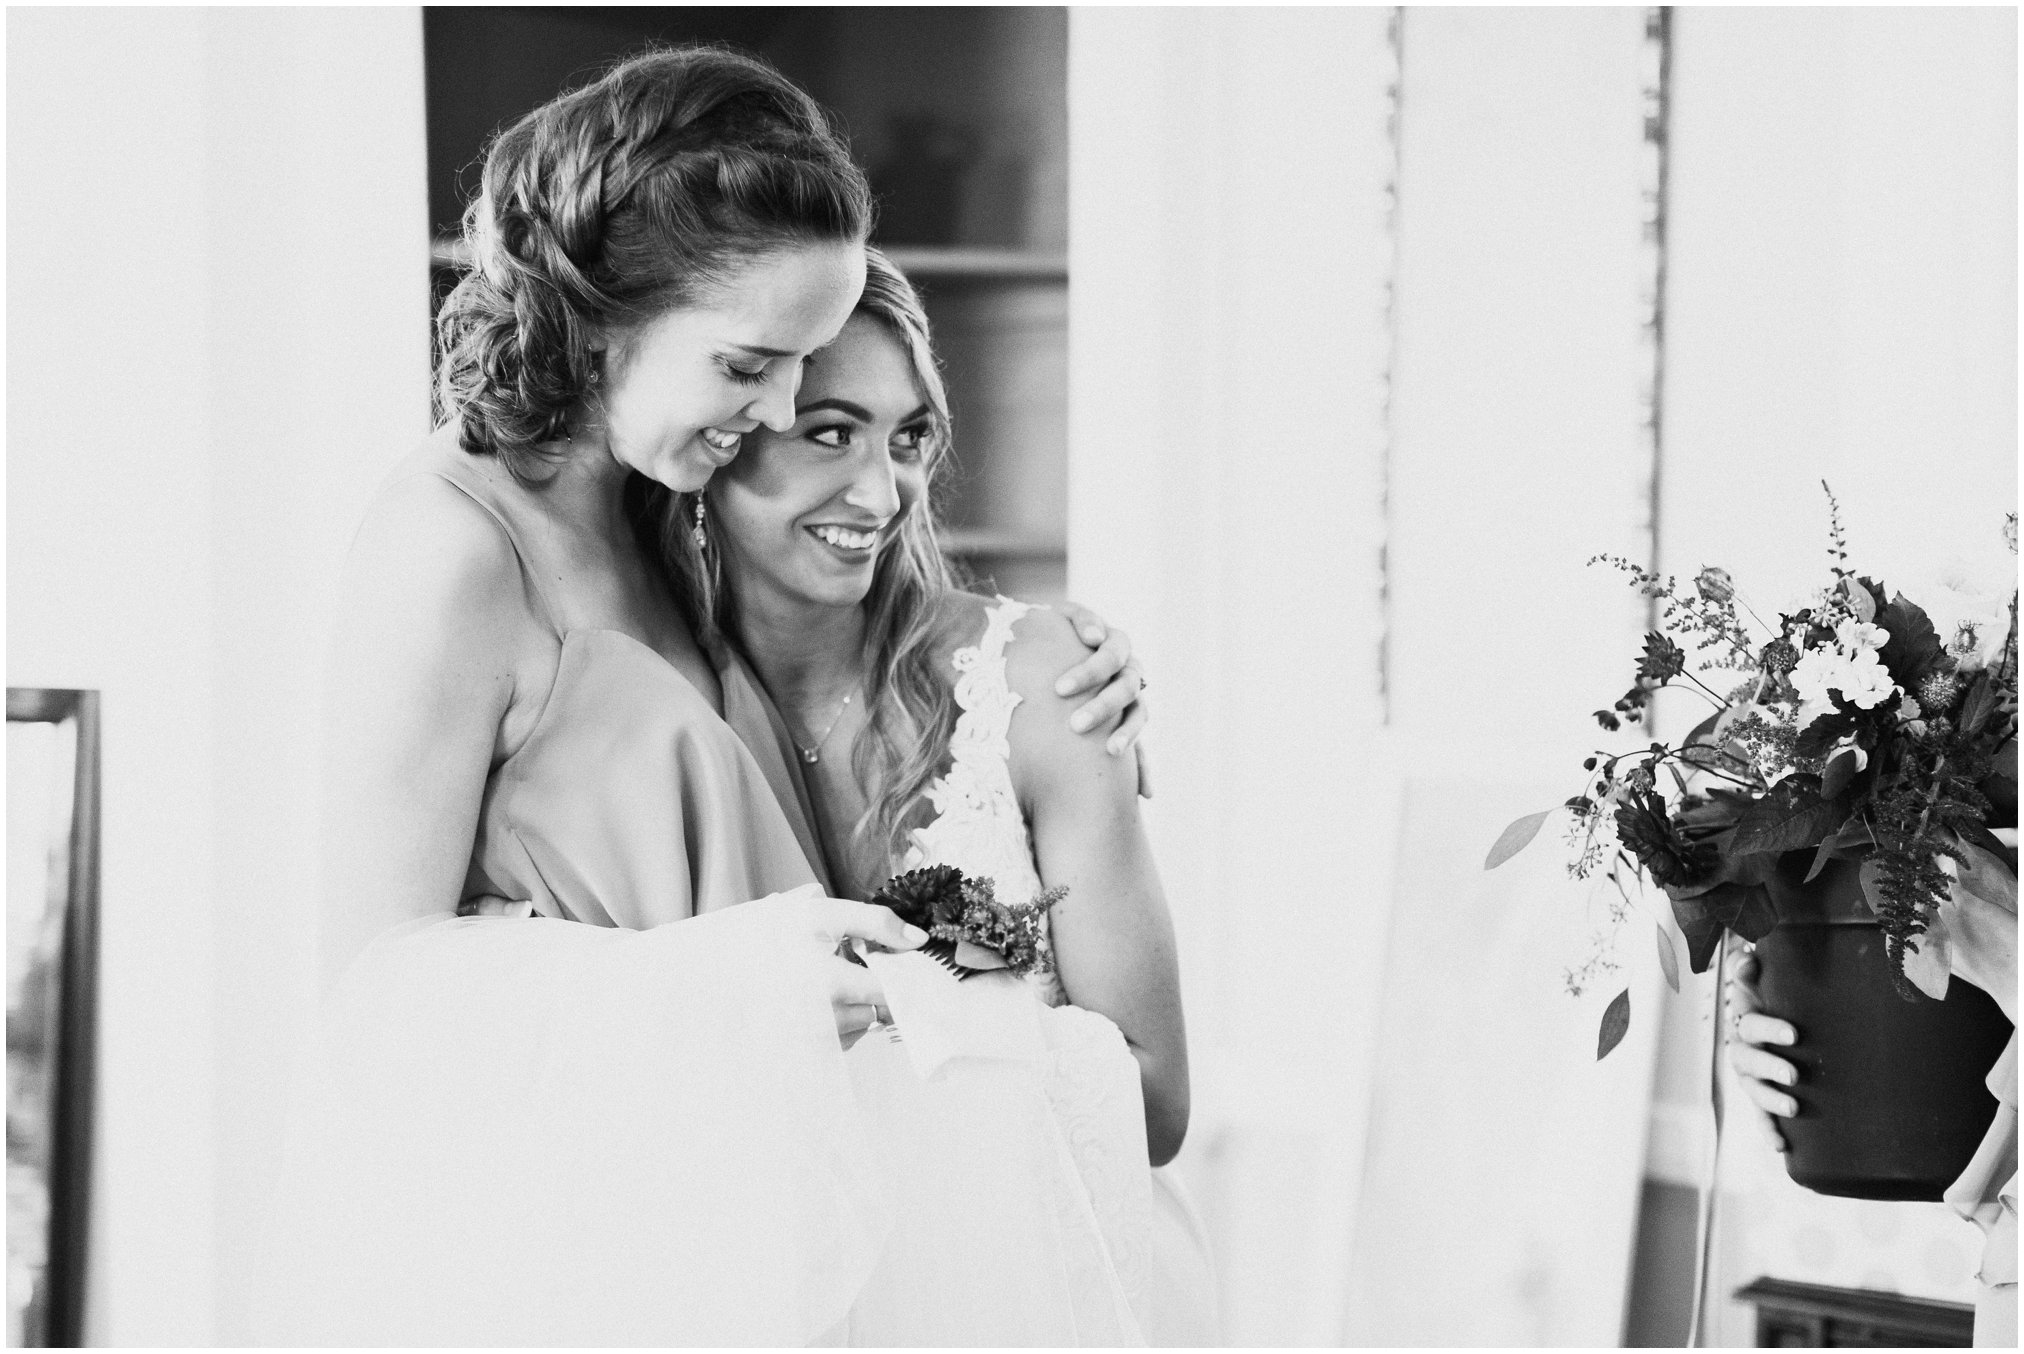 Annapolis Wedding Photographer, Kate Ann Photography, Timberlake Farm, Timberlake Farm Wedding, Airbnb wedding, Annapolis Bride, Bridesmaids First Look